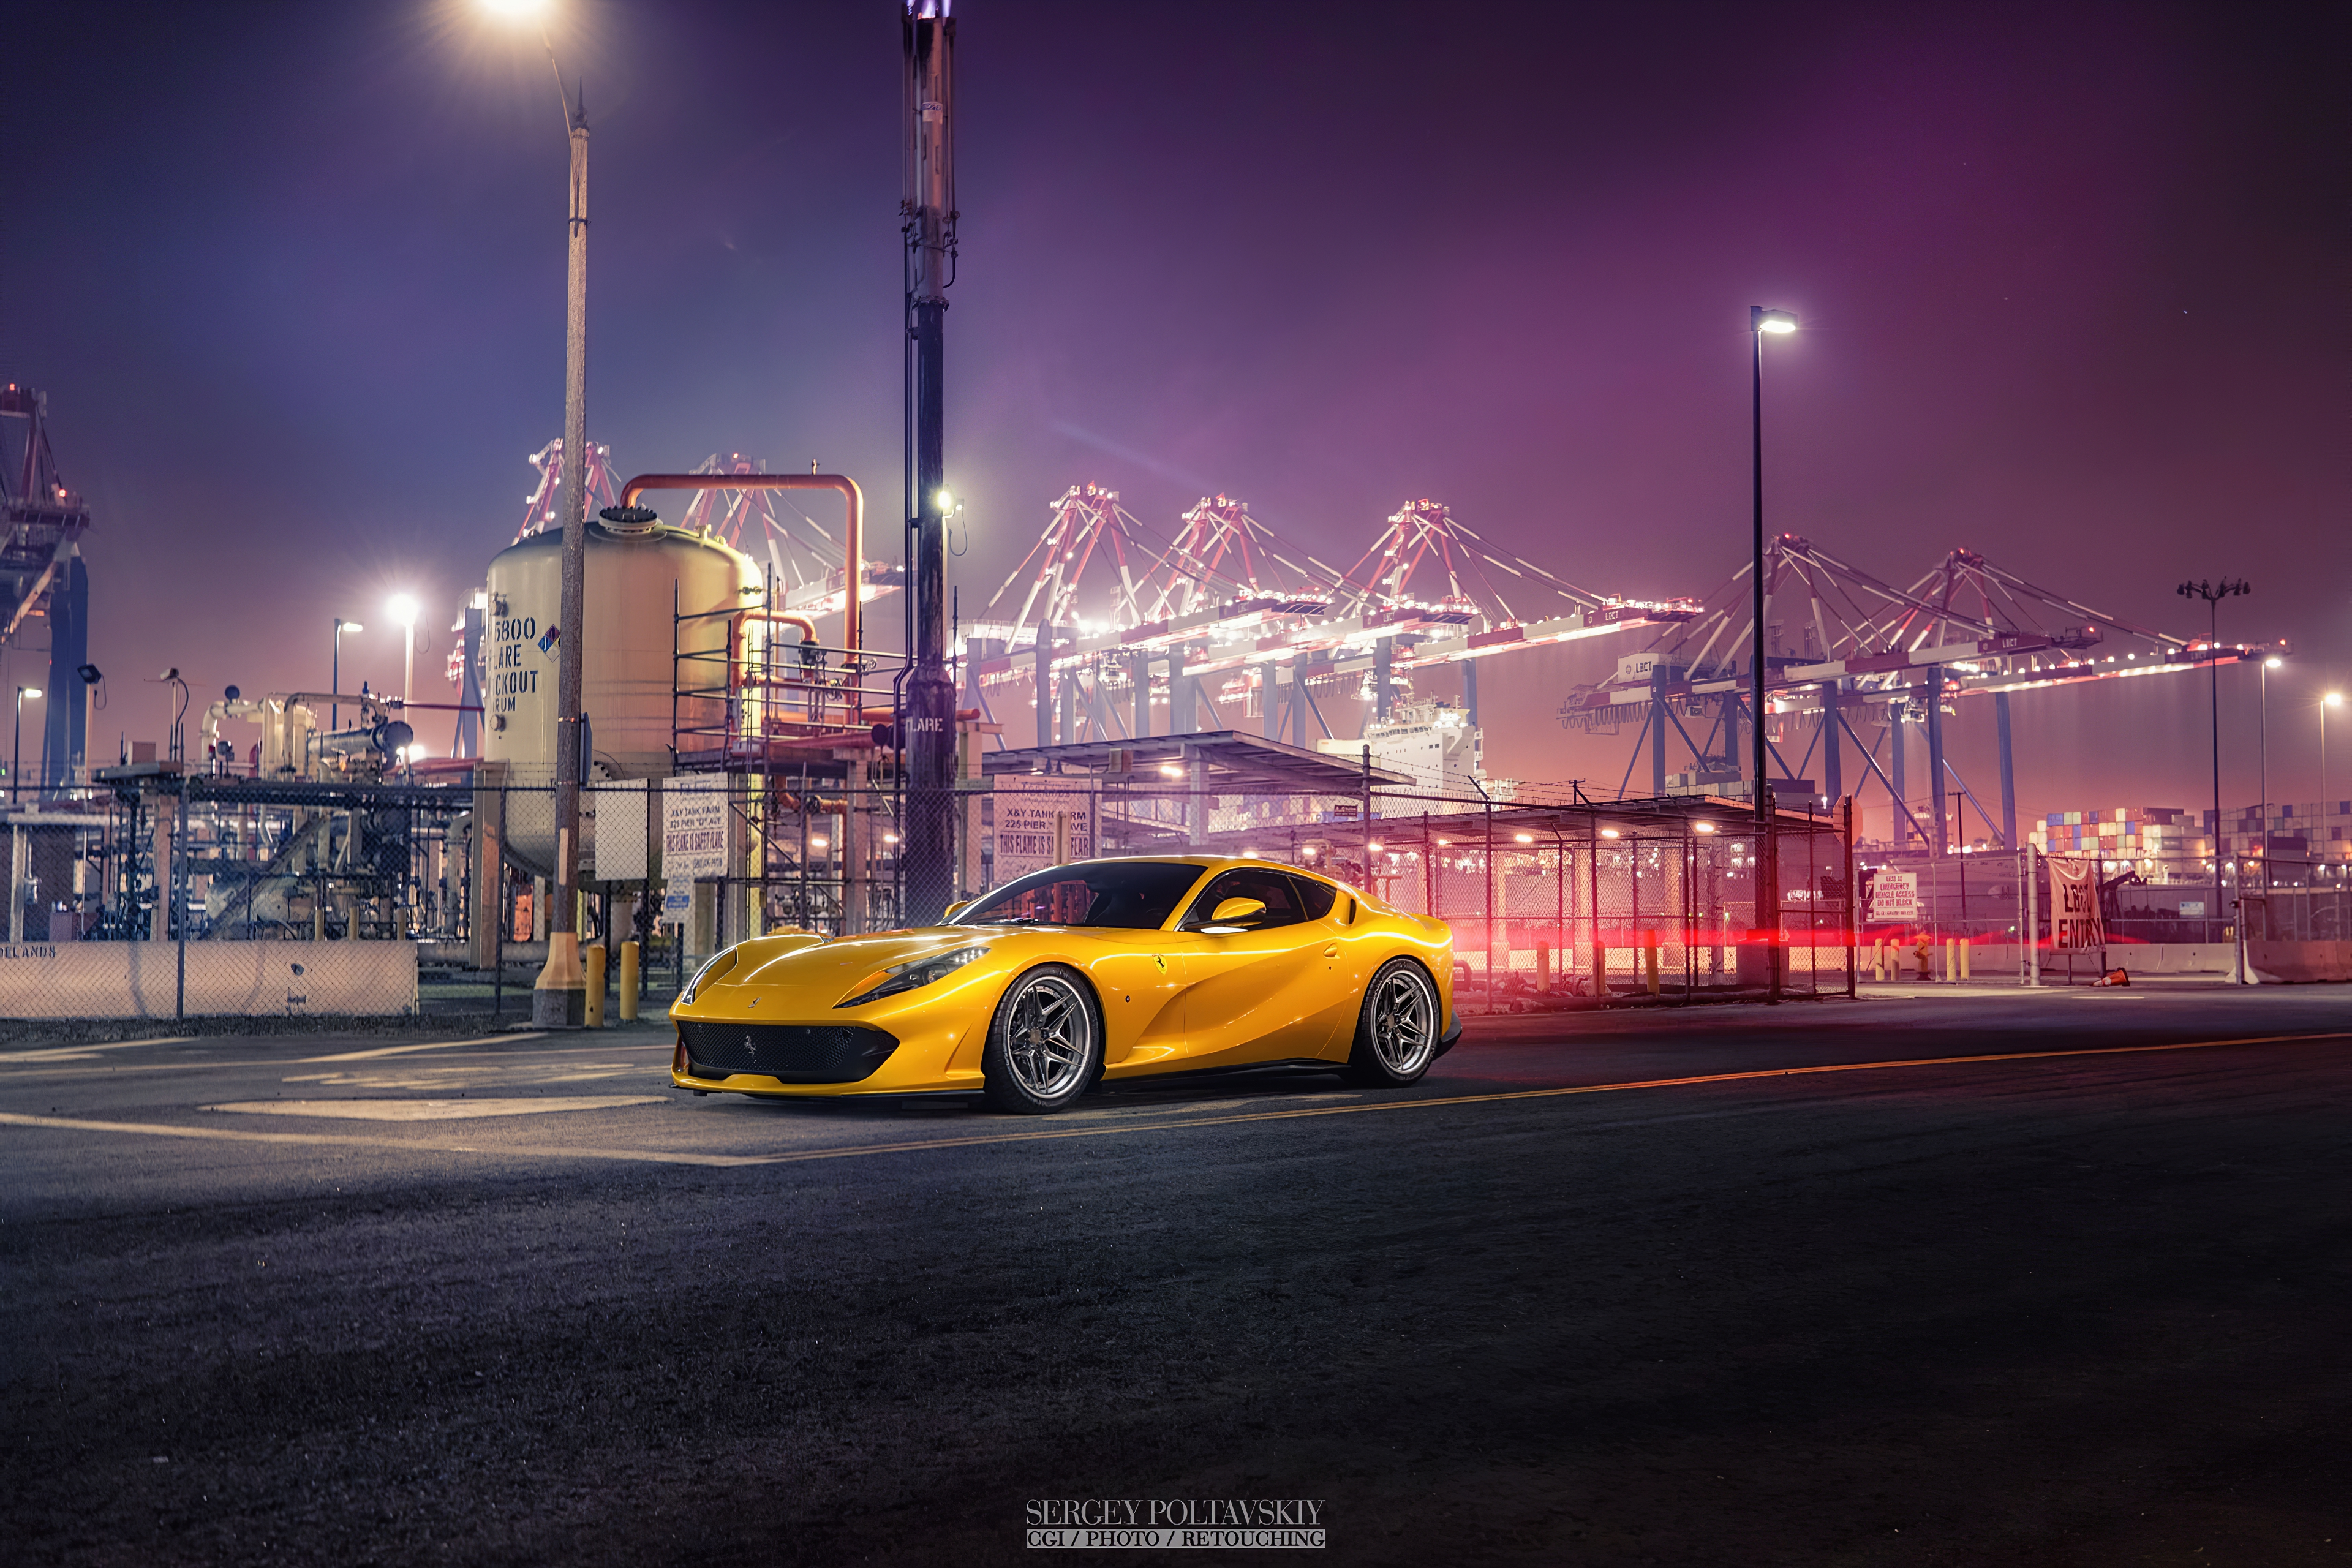 ferrari yellow art 1577653833 - Ferrari Yellow Art - Ferrari Yellow Art 4k wallpaper